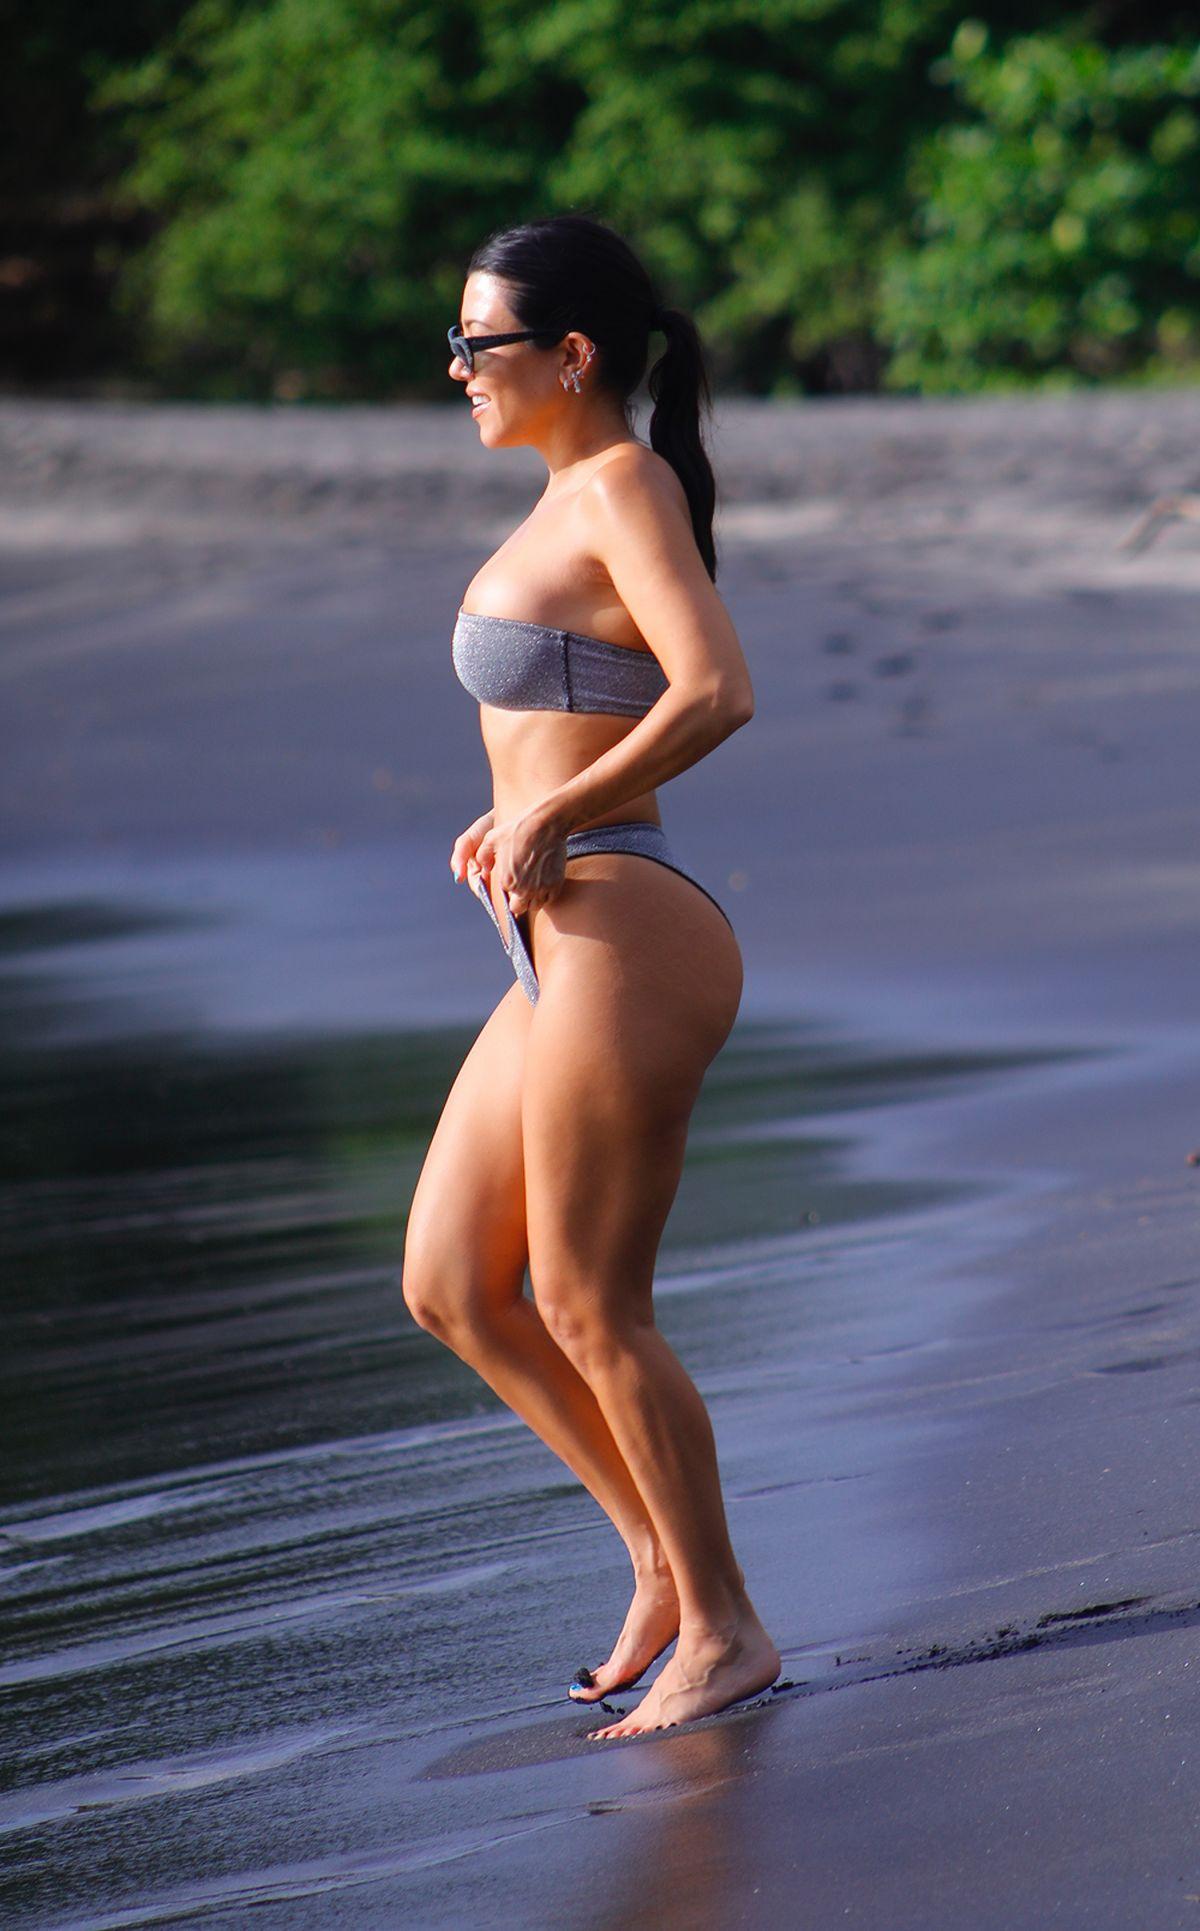 KIM and KOURTNEY KARDASHIAN in Bikinis on Vacation in ...